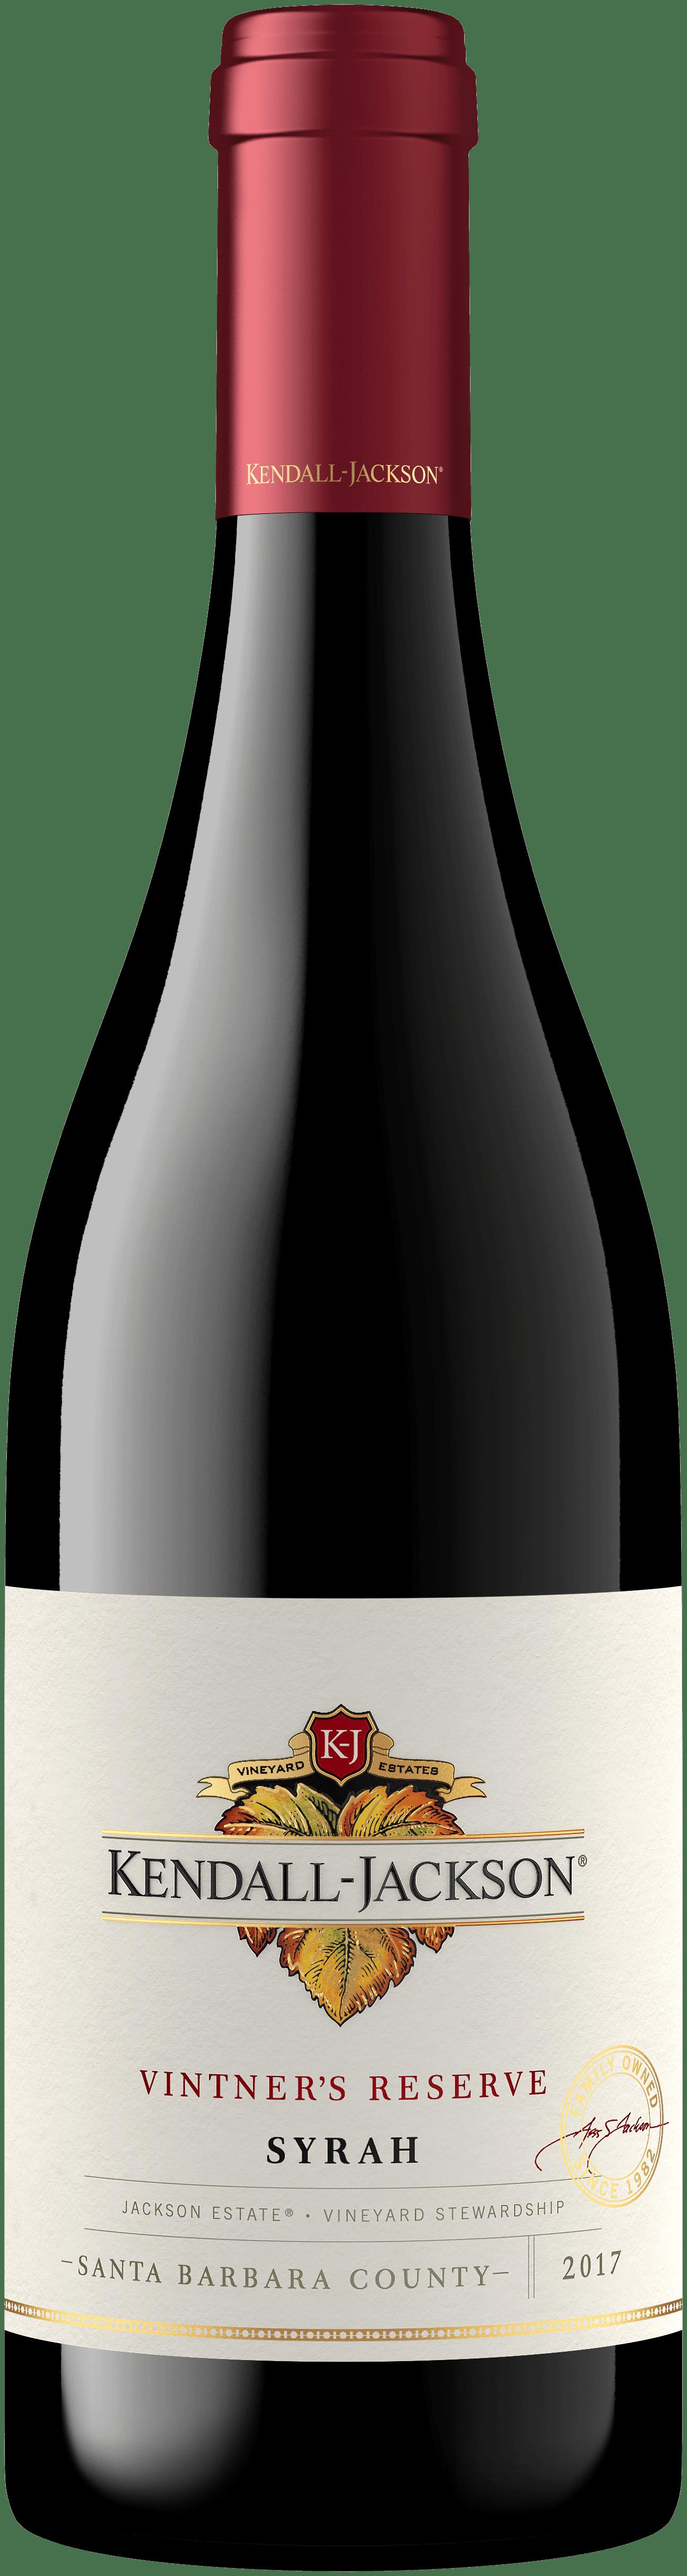 Dollhouse Miniature Bottle of Kendall Jackson Chardonnay Wine 1:12 Scale